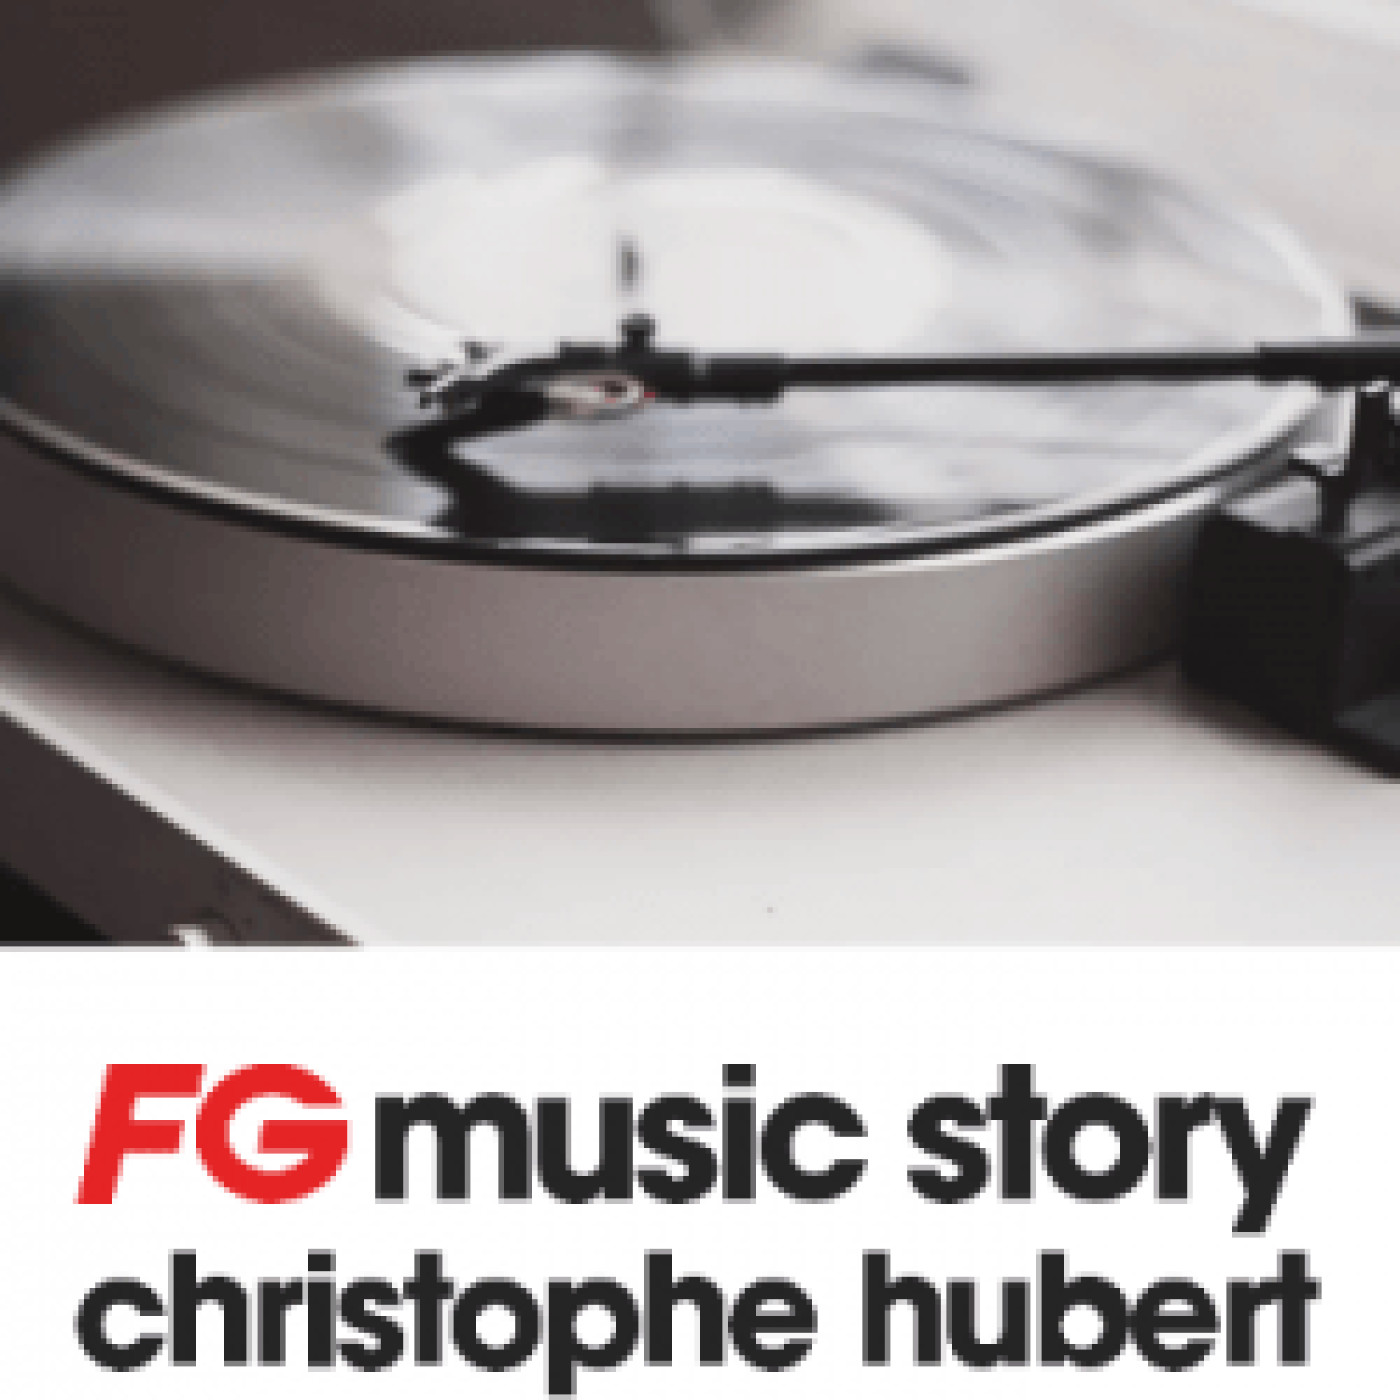 FG MUSIC STORY : AUDIENSE